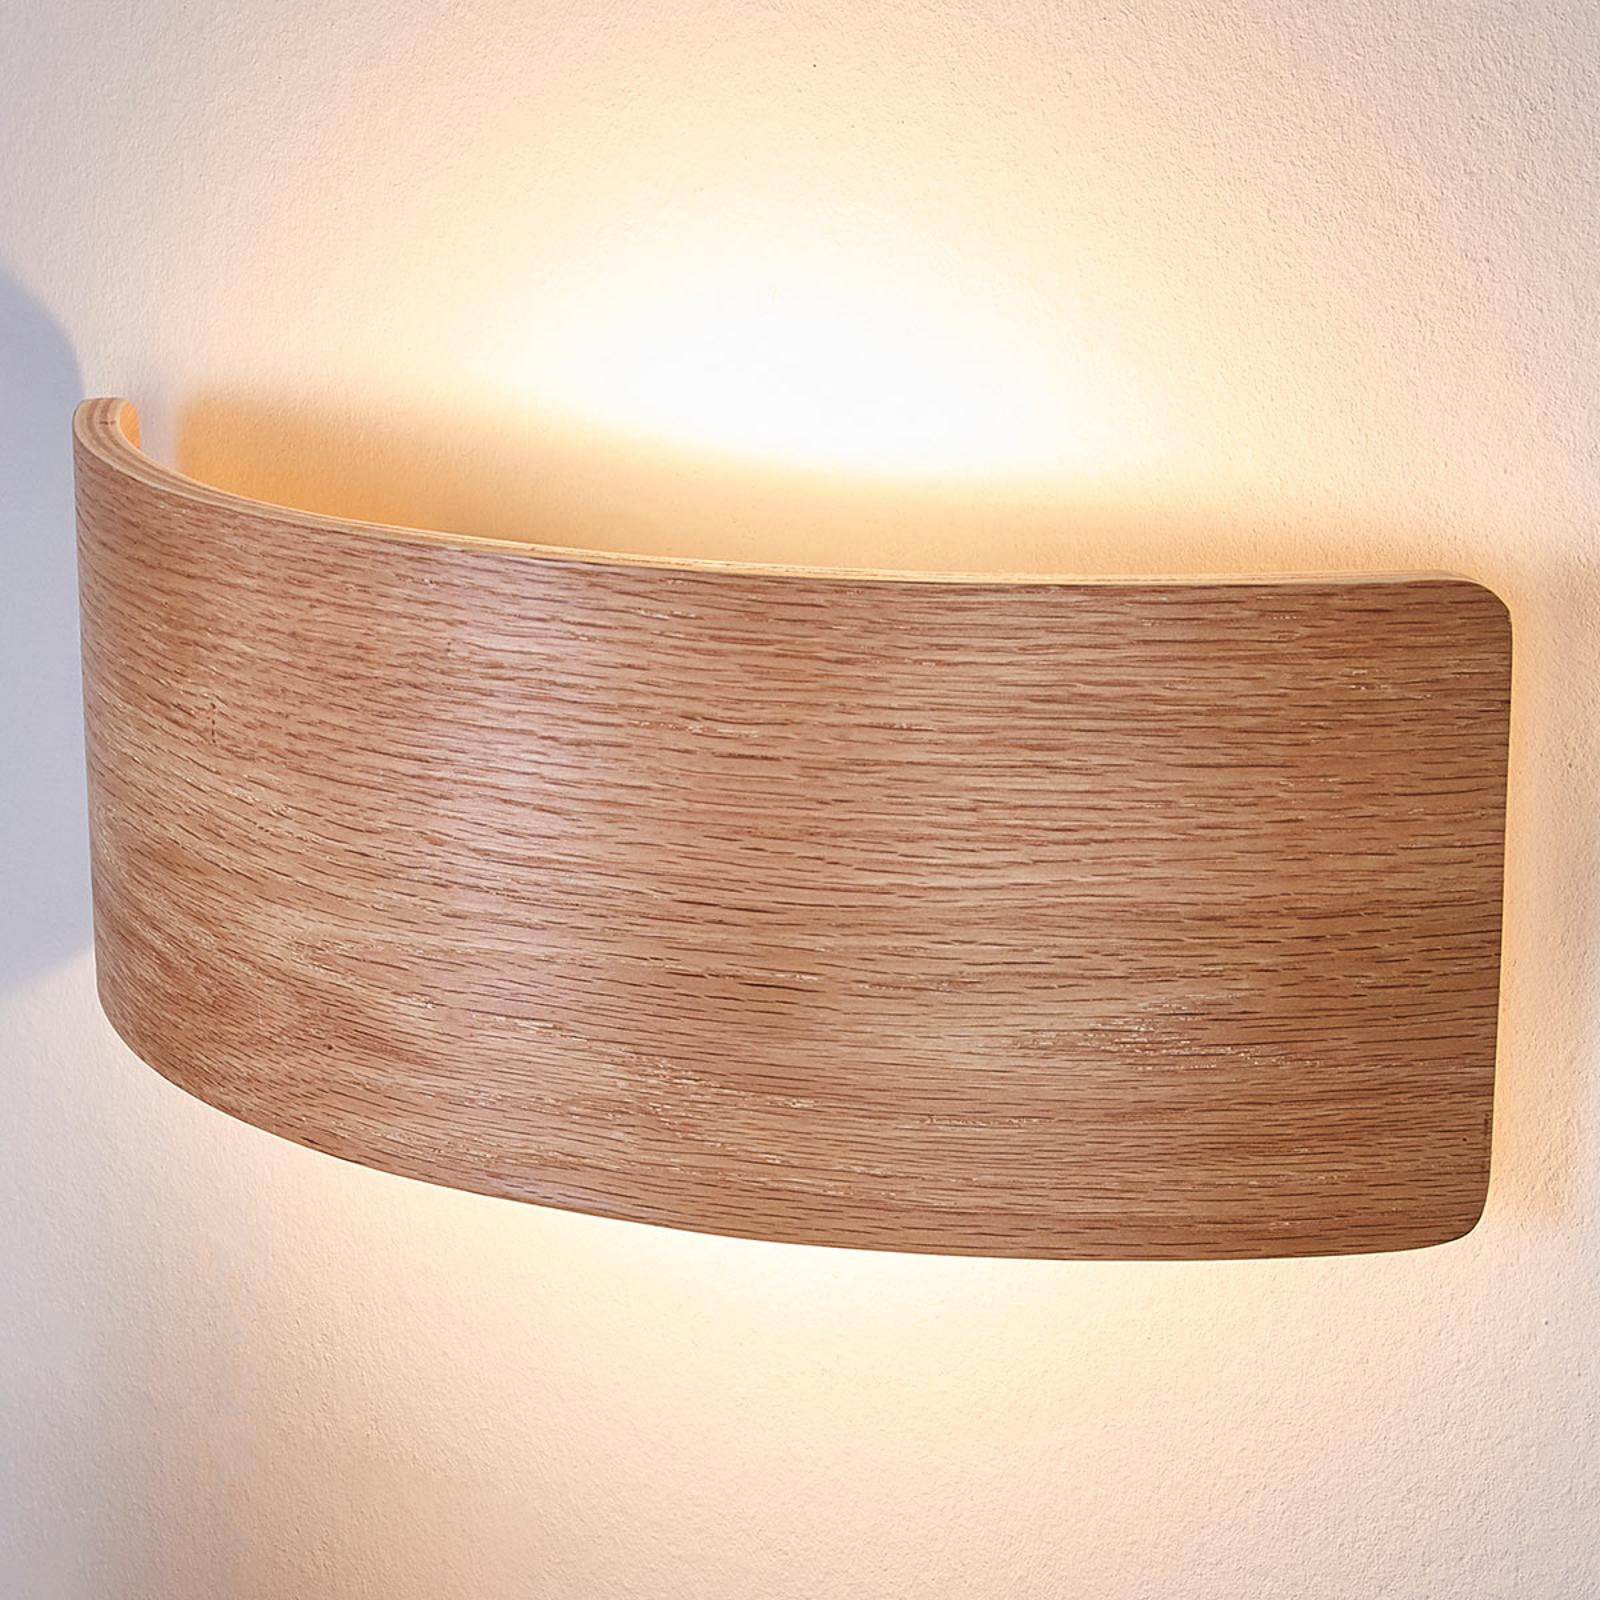 Aantrekkelijke houten wandlamp Rafailia met LEDs